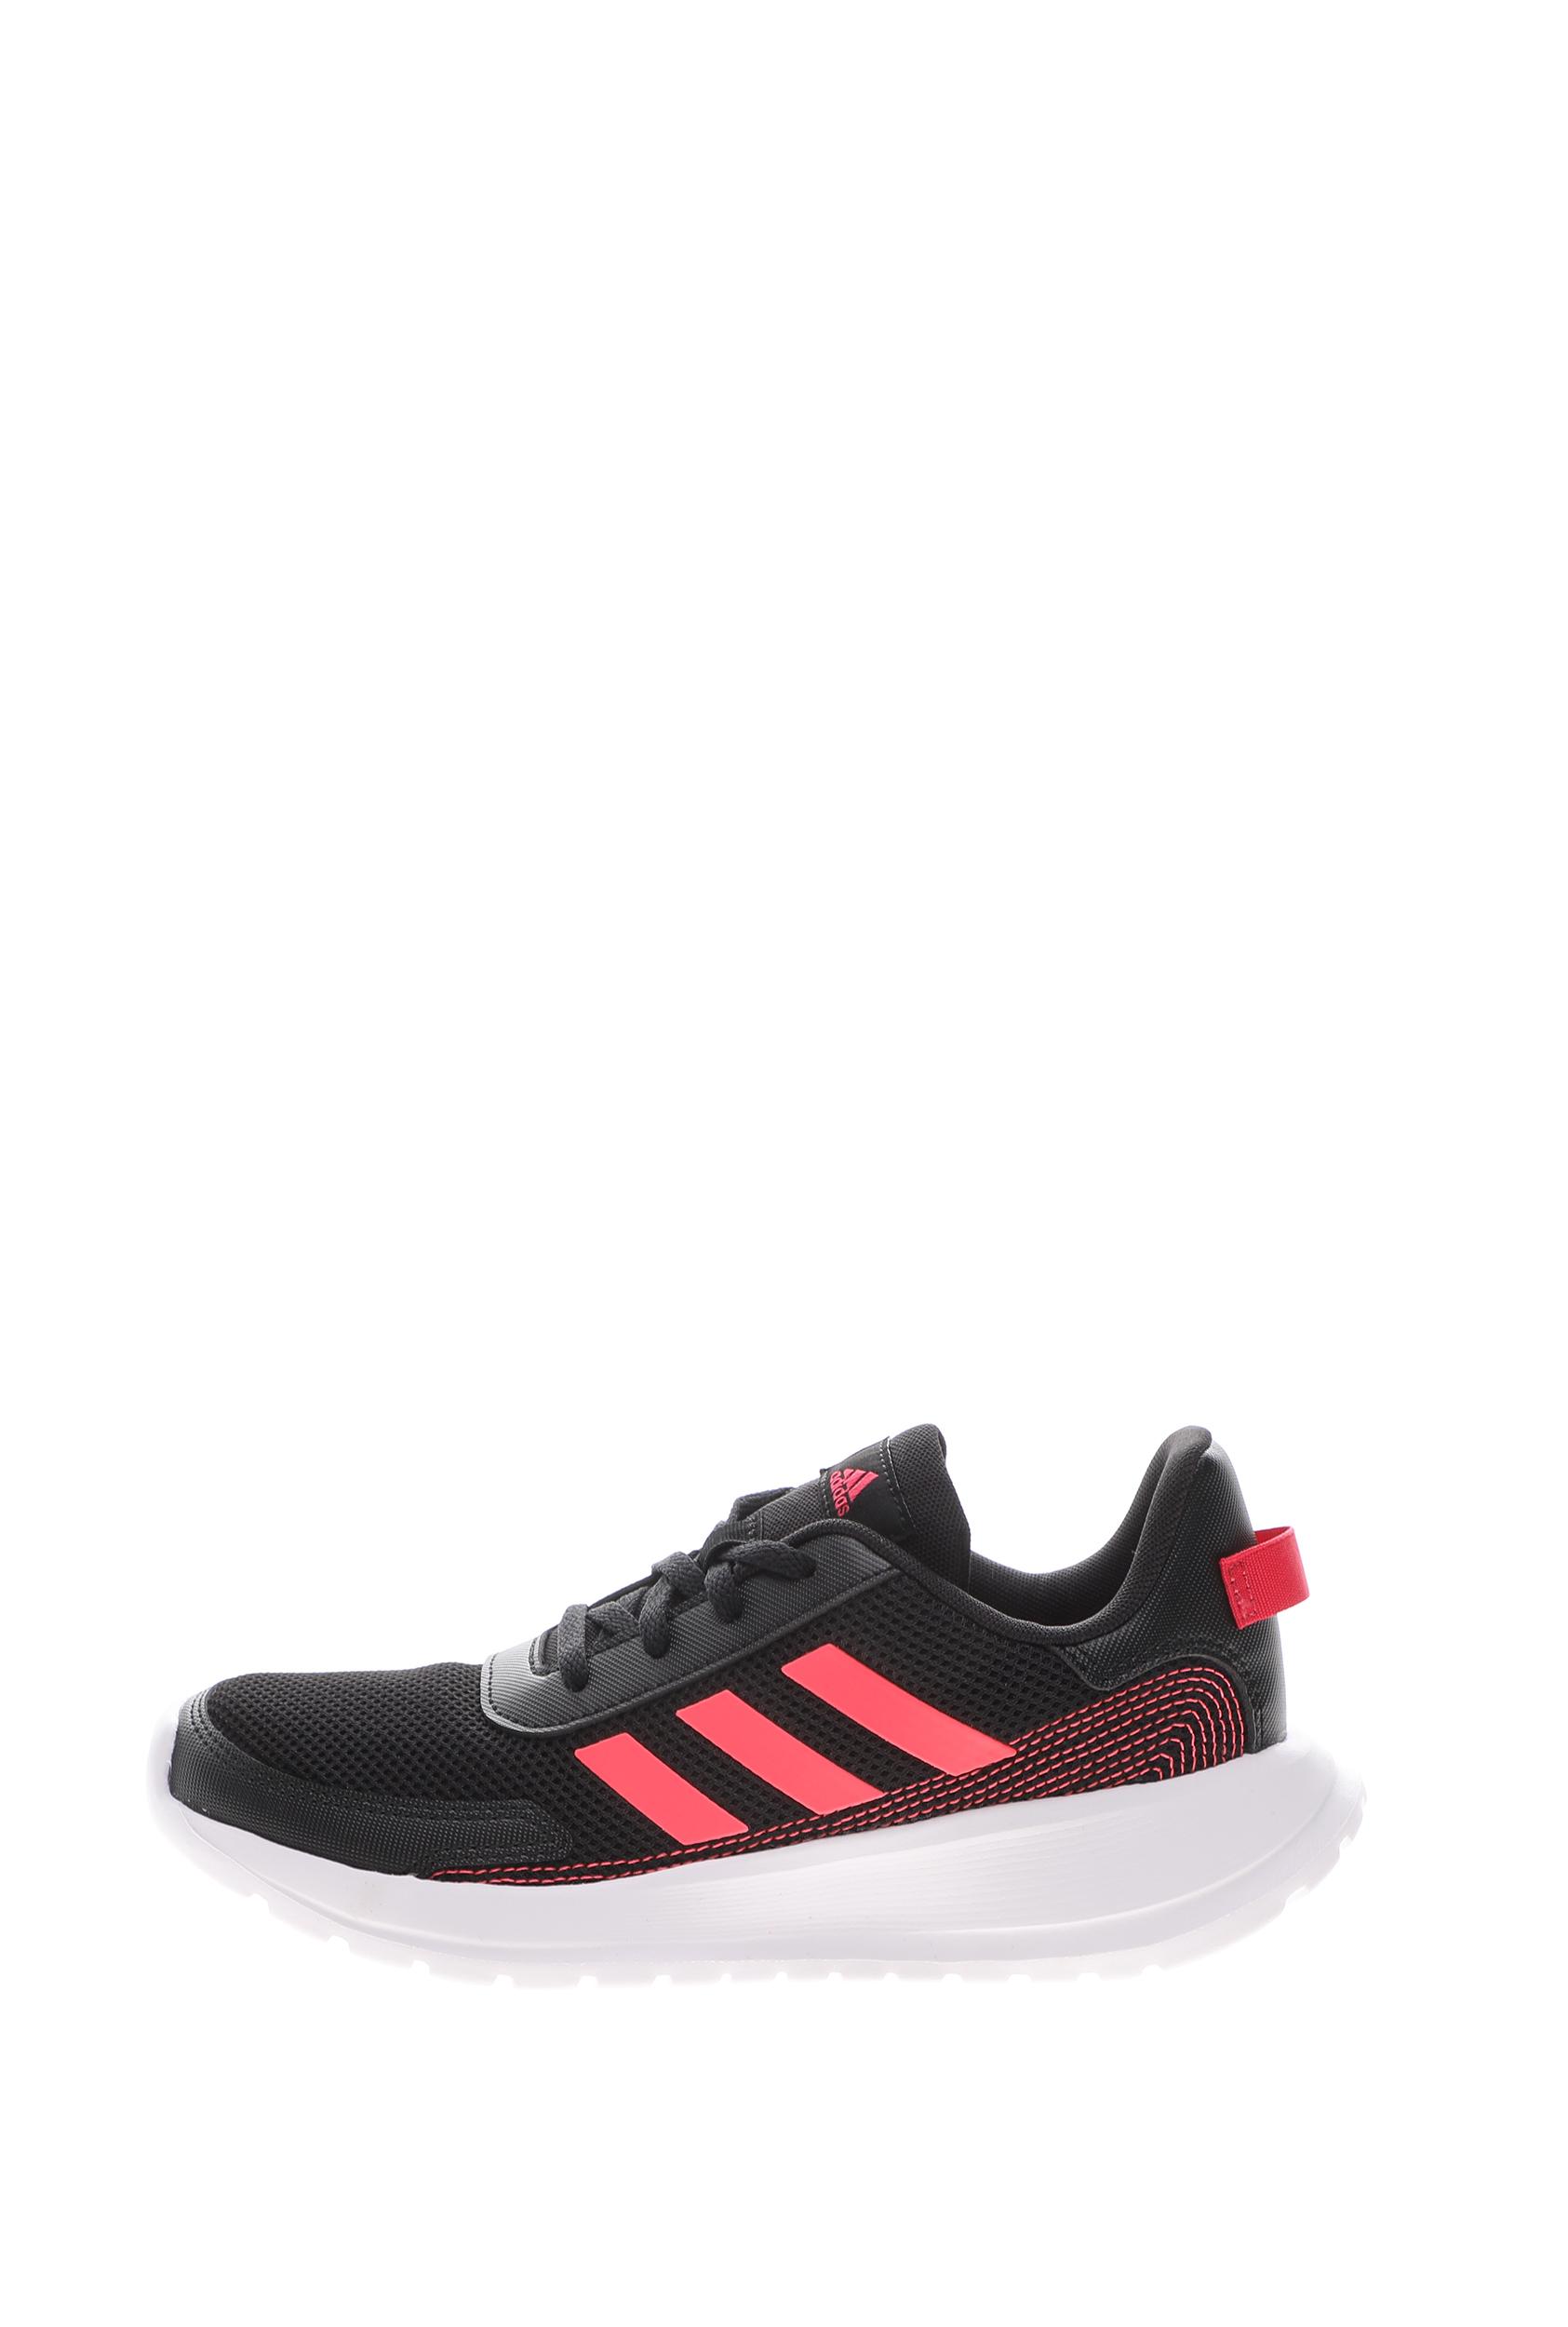 ADIDAS – Παιδικά αθλητικά παπούτσια adidas TENSOR μαύρα